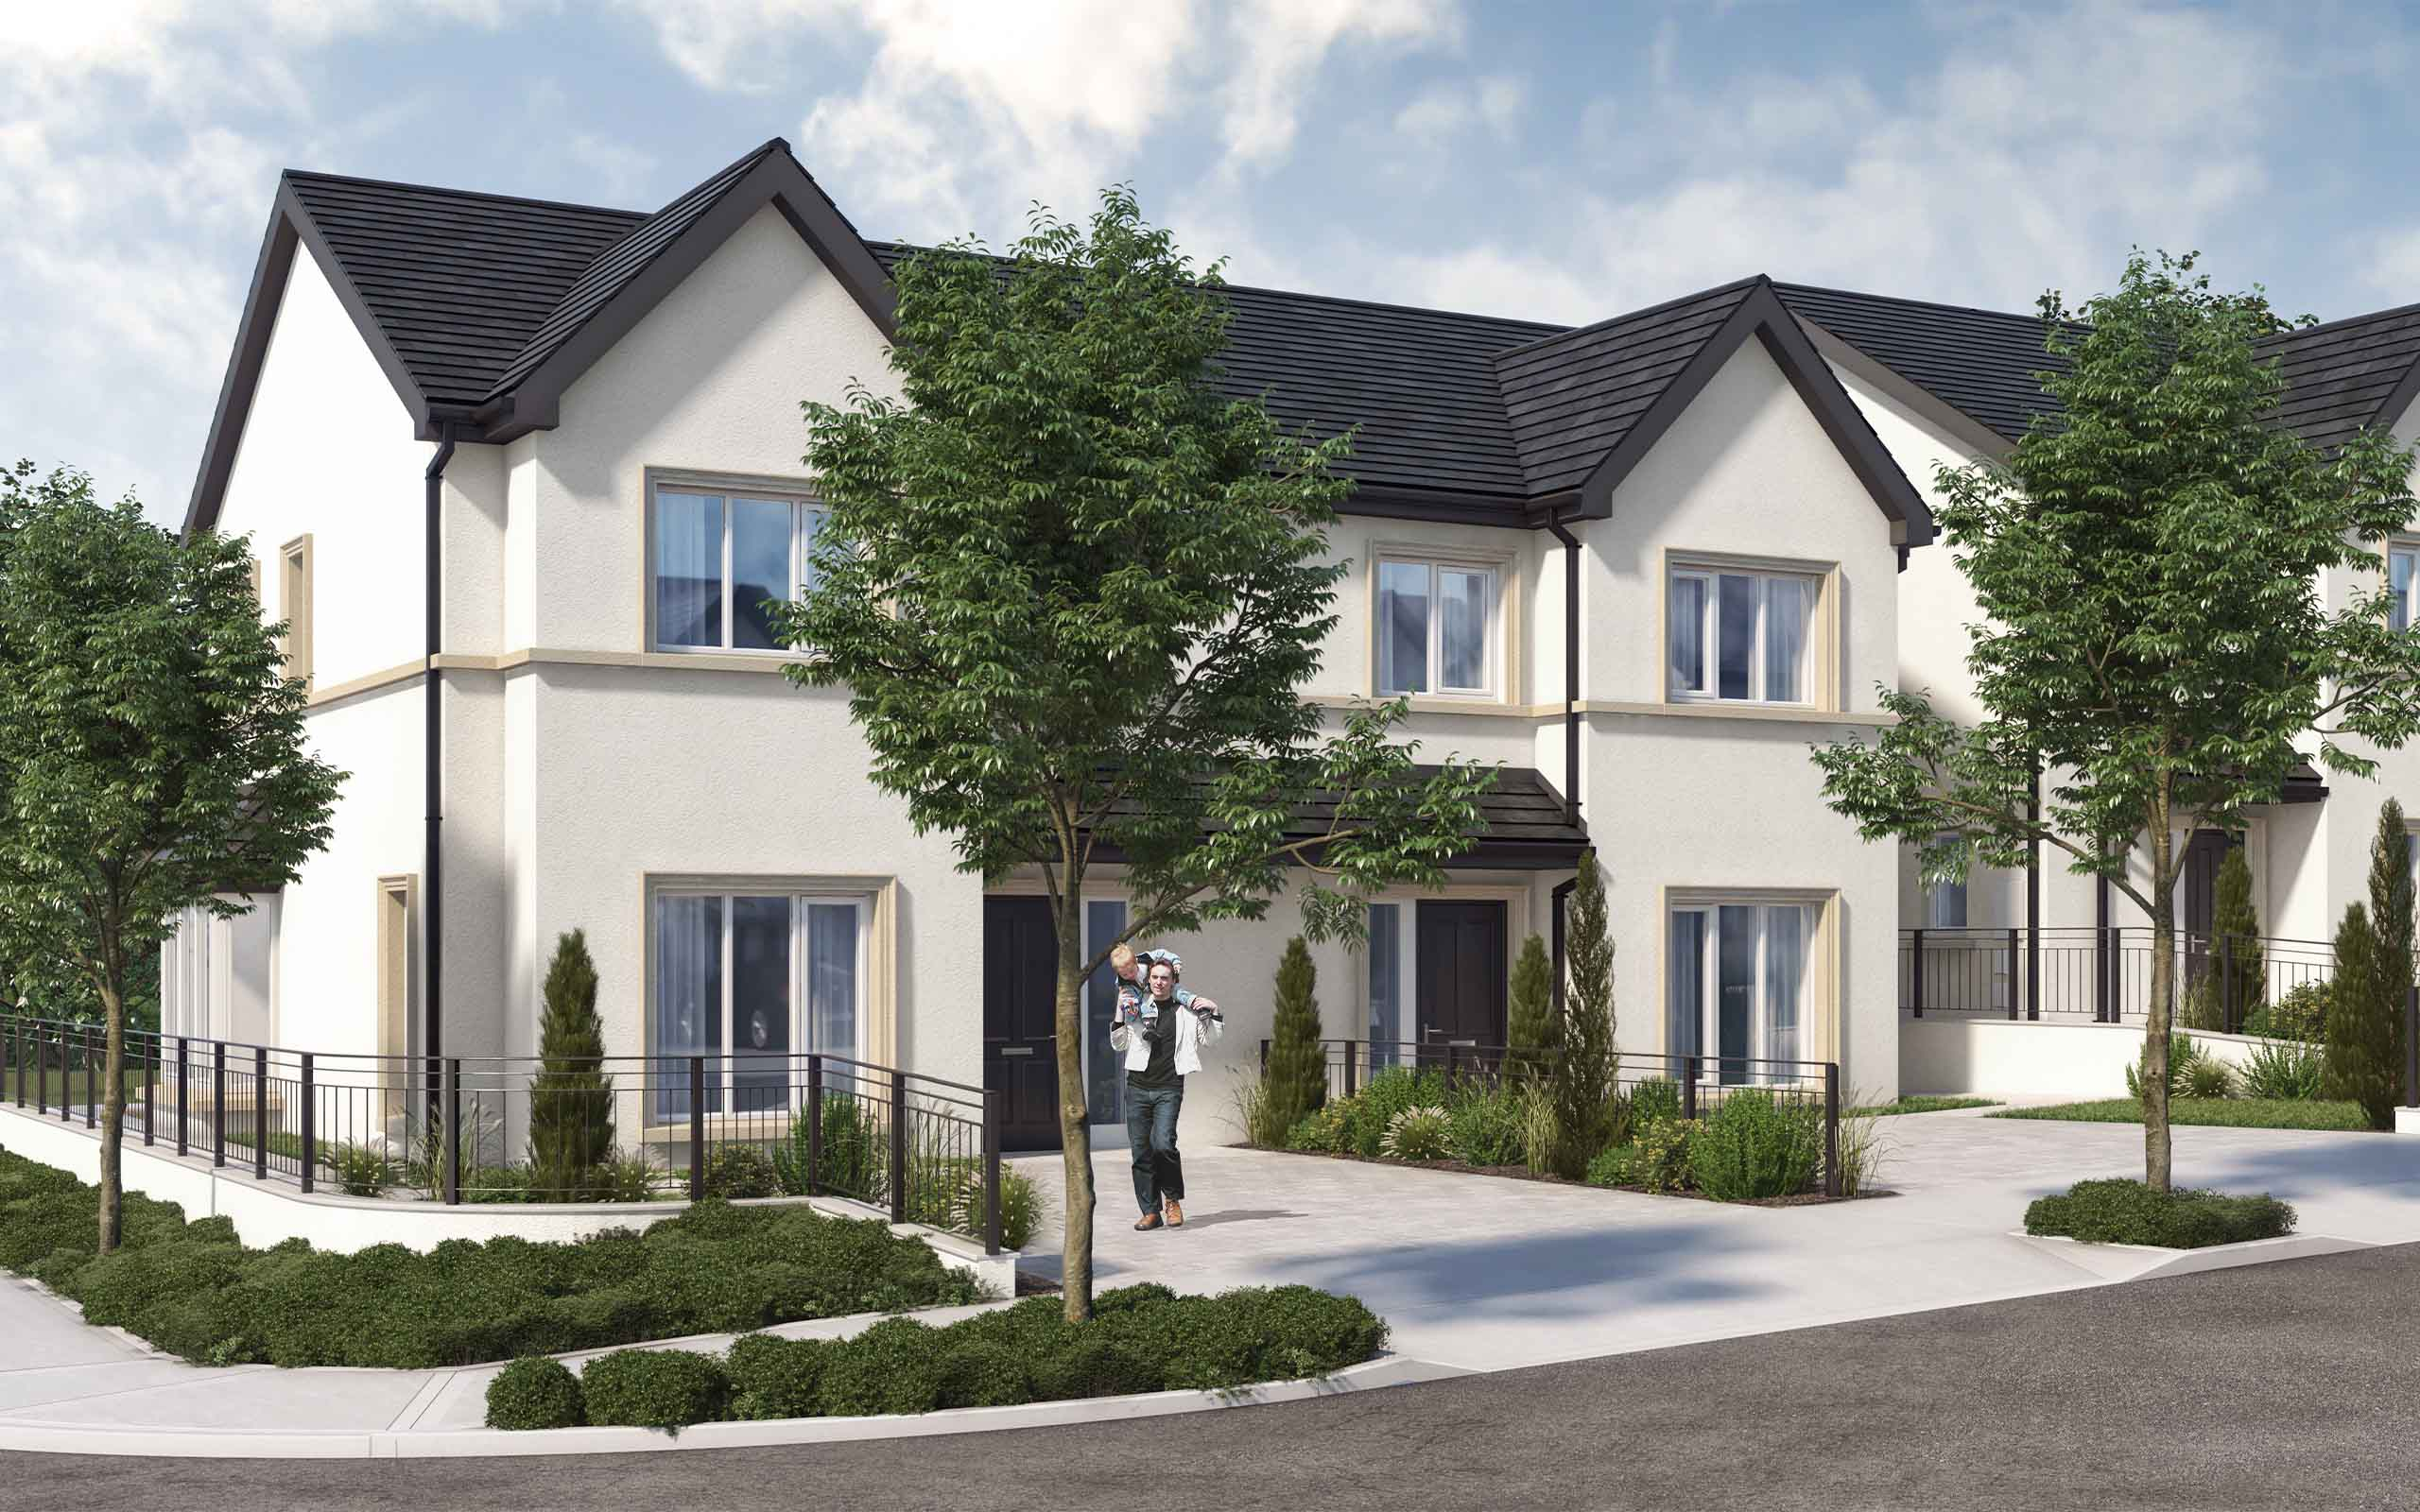 Architectural CGI of Housing Development in Ballinglanna, Glanmire